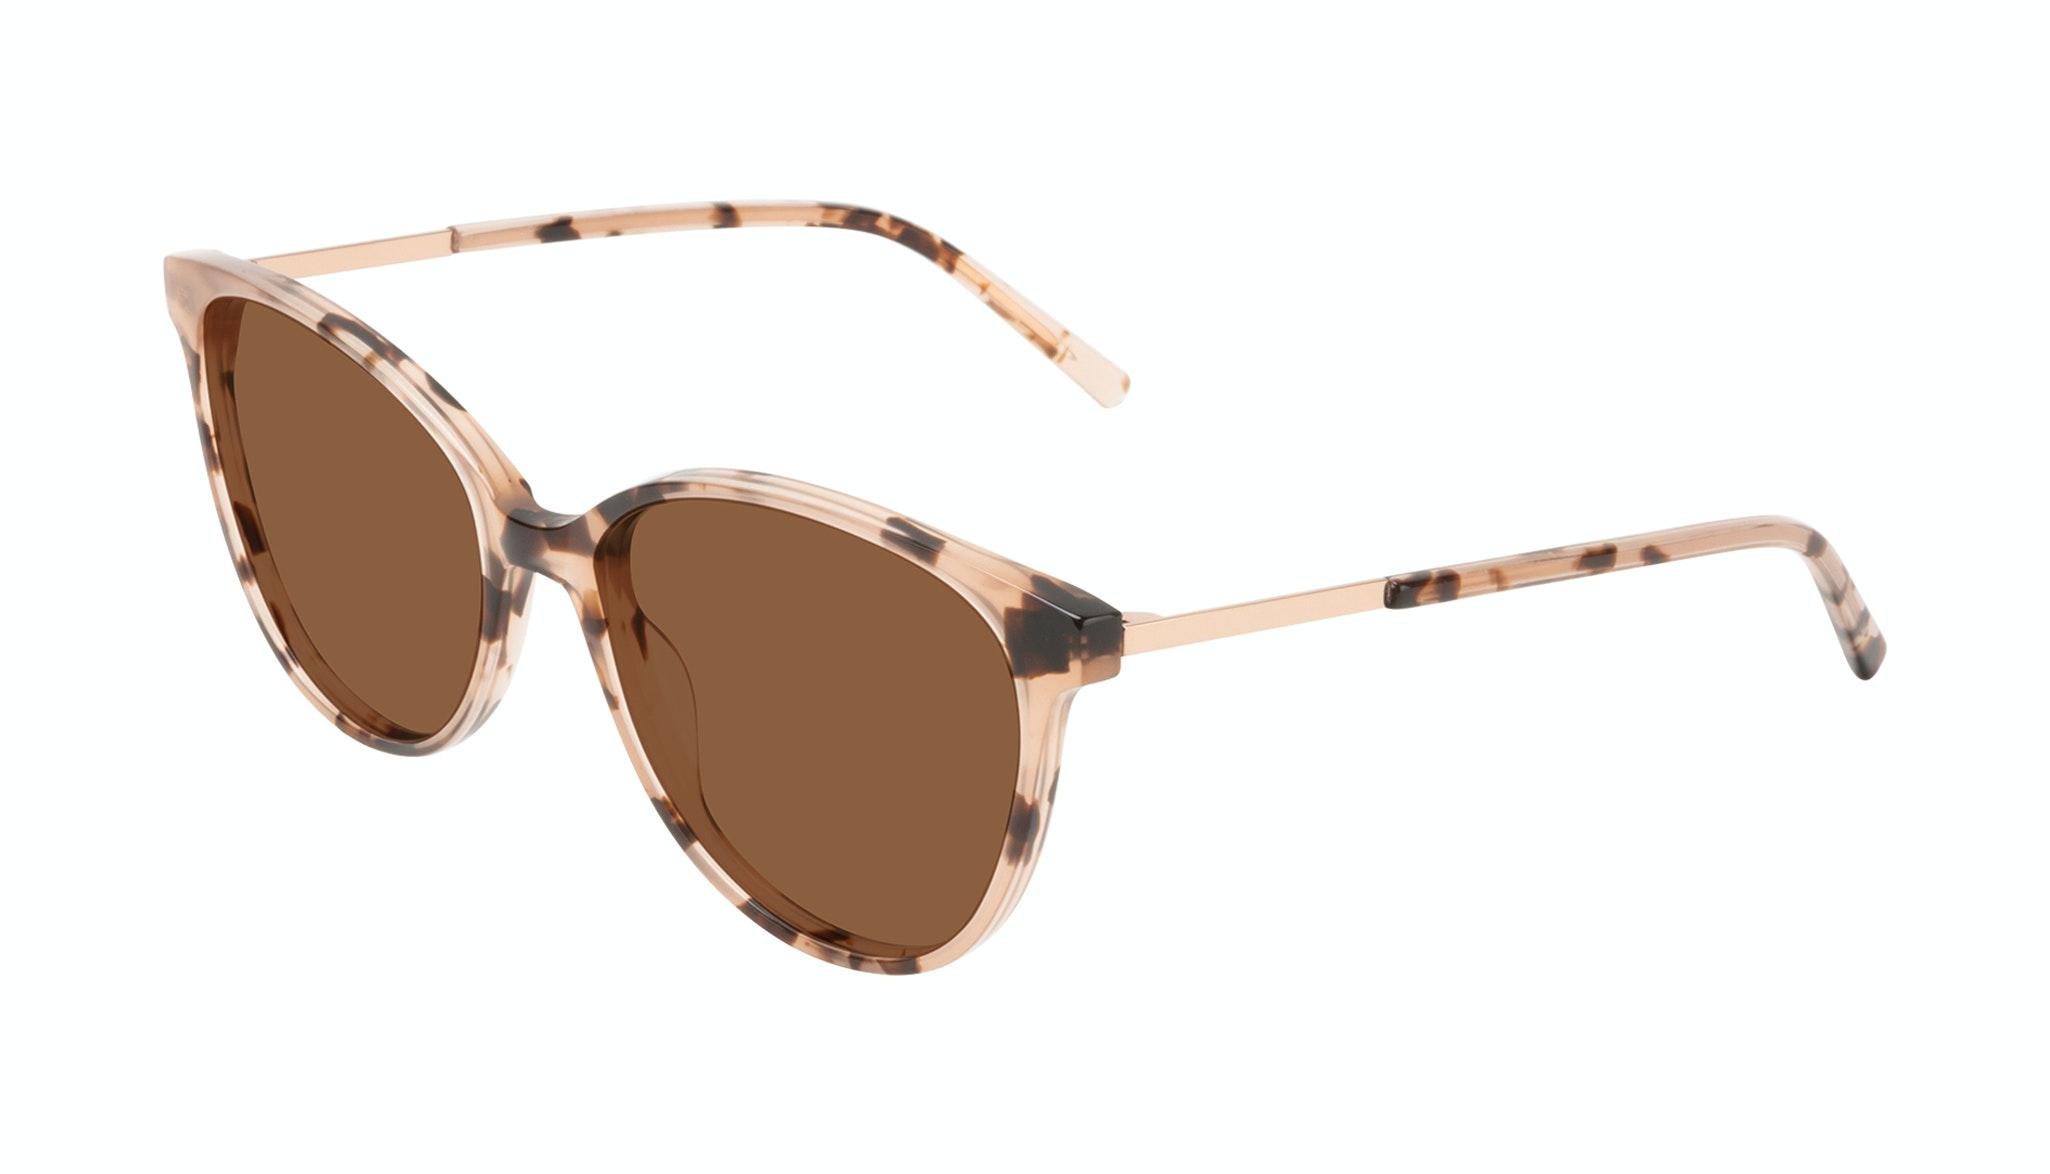 Affordable Fashion Glasses Round Sunglasses Women Imagine II Plus Tortie Tilt